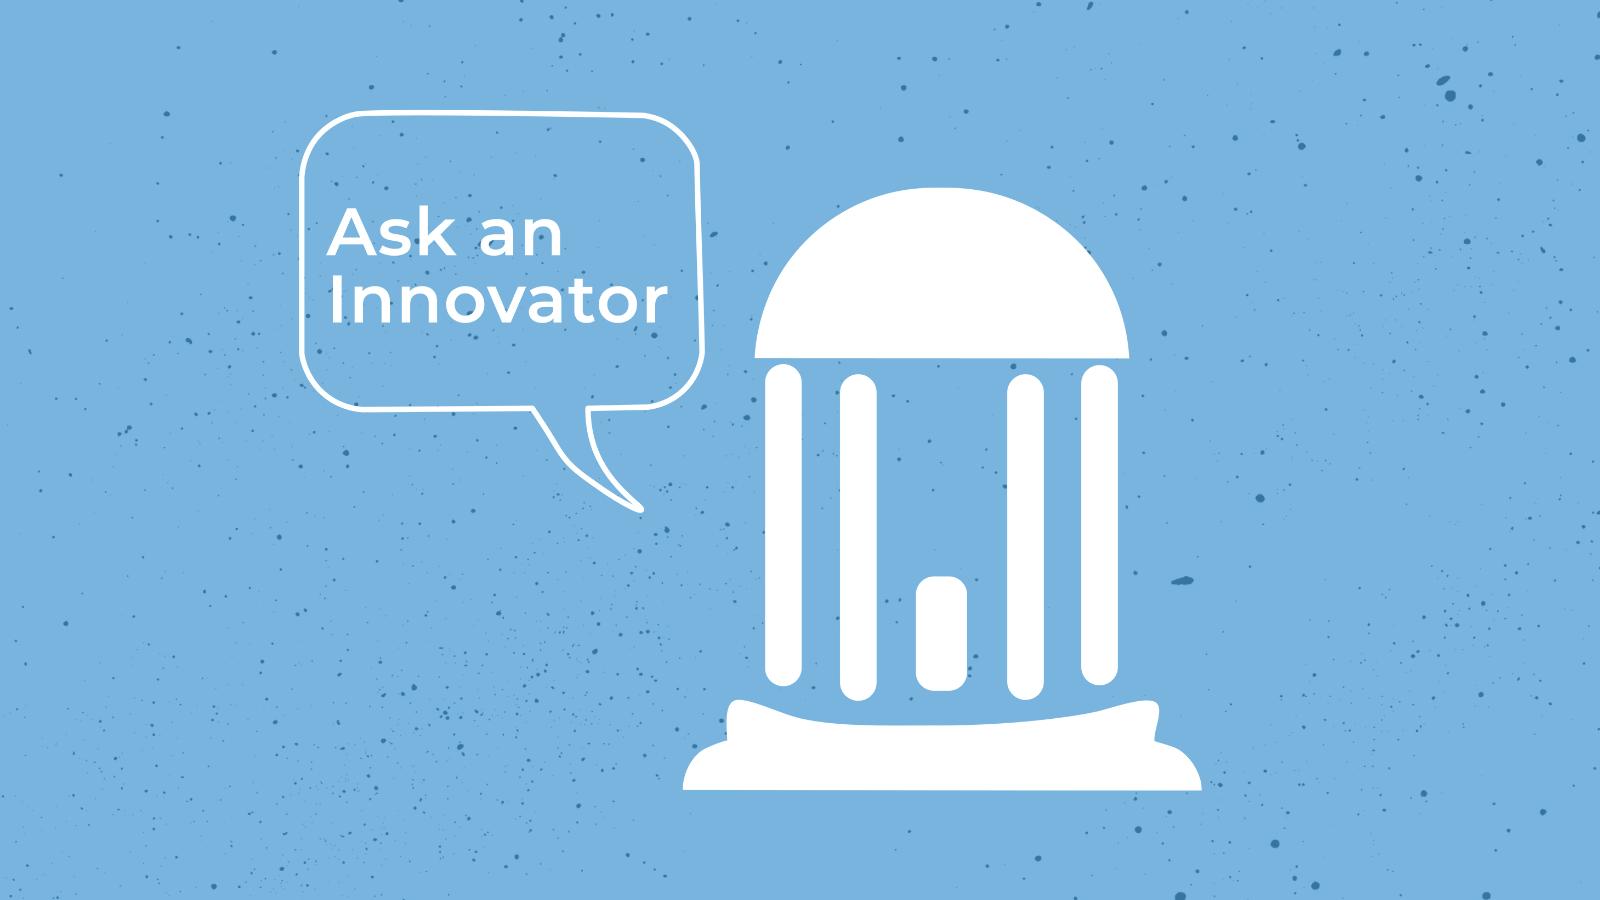 ask-an-innovator-banner